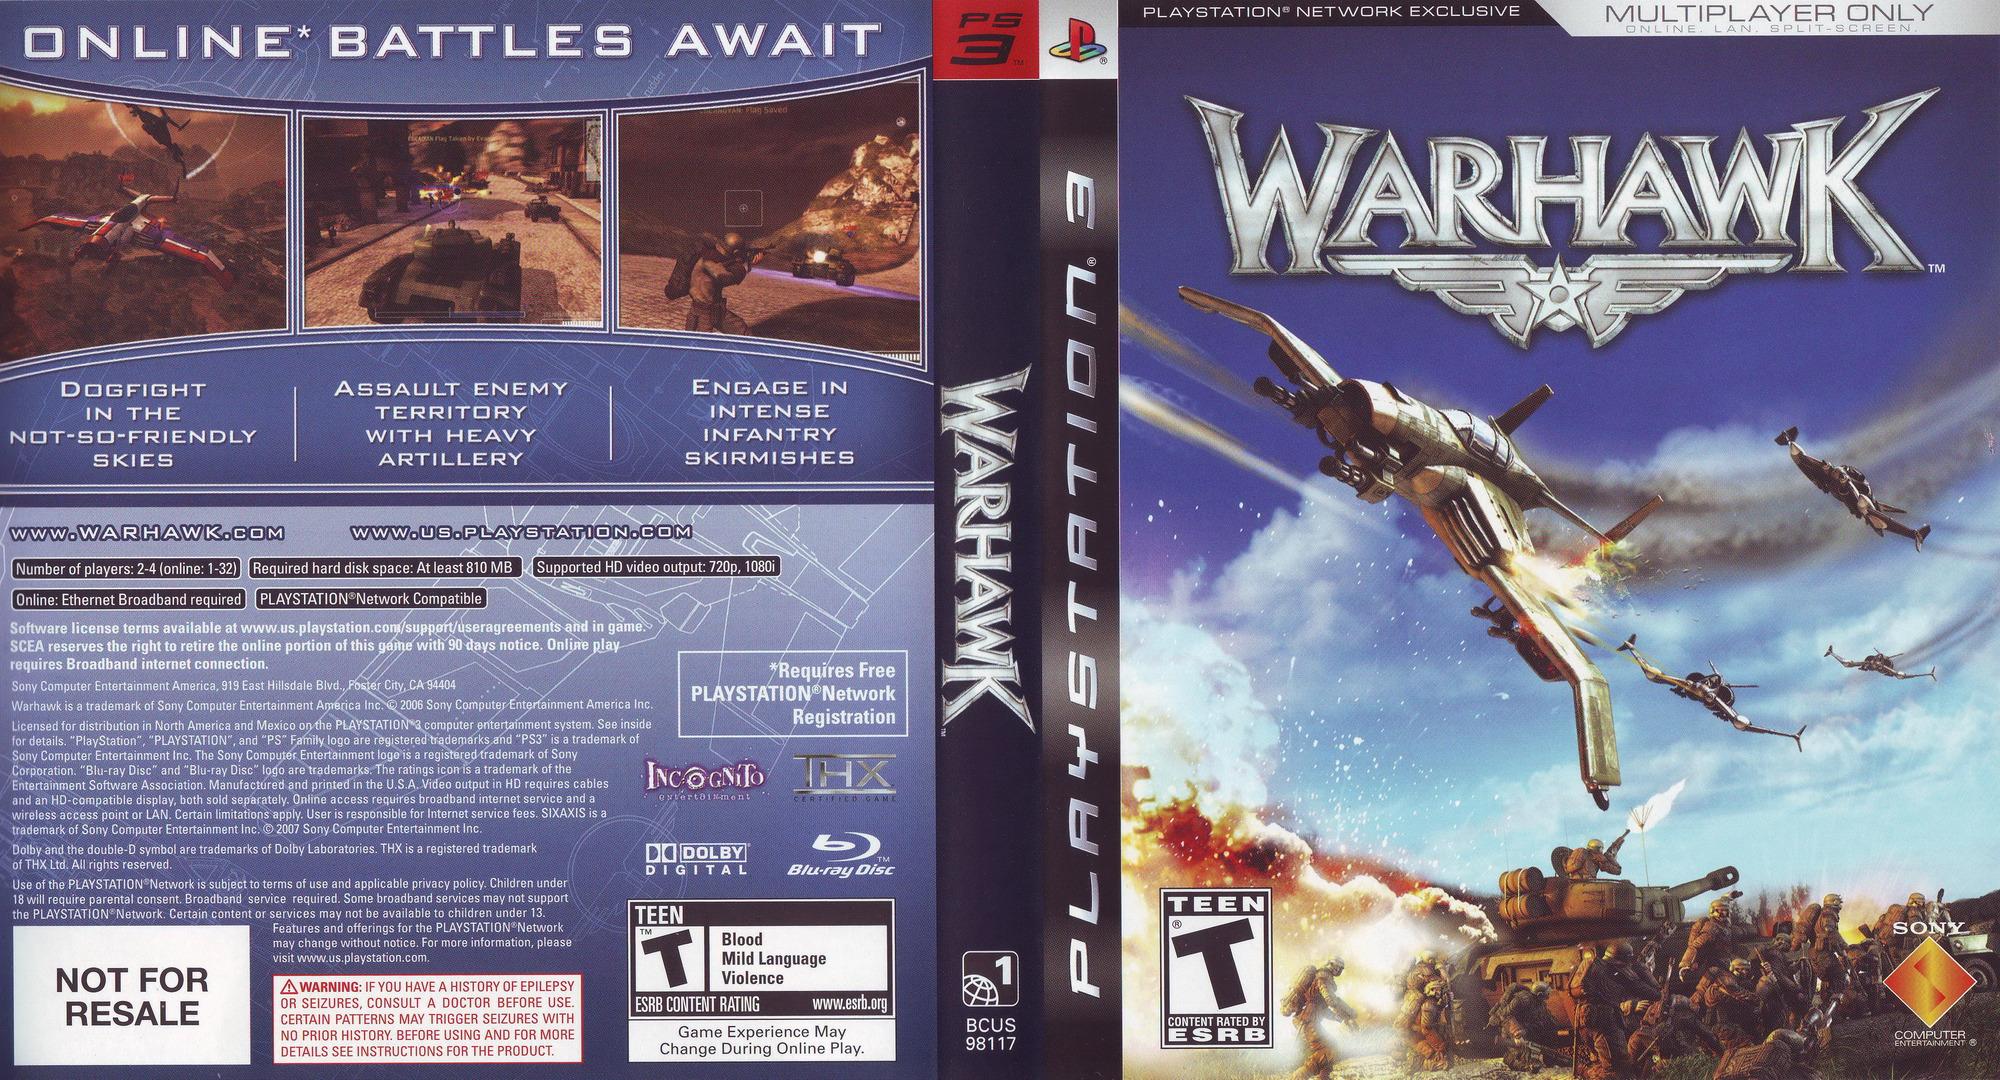 Warhawk PS3 coverfullHQ (BCUS98162)